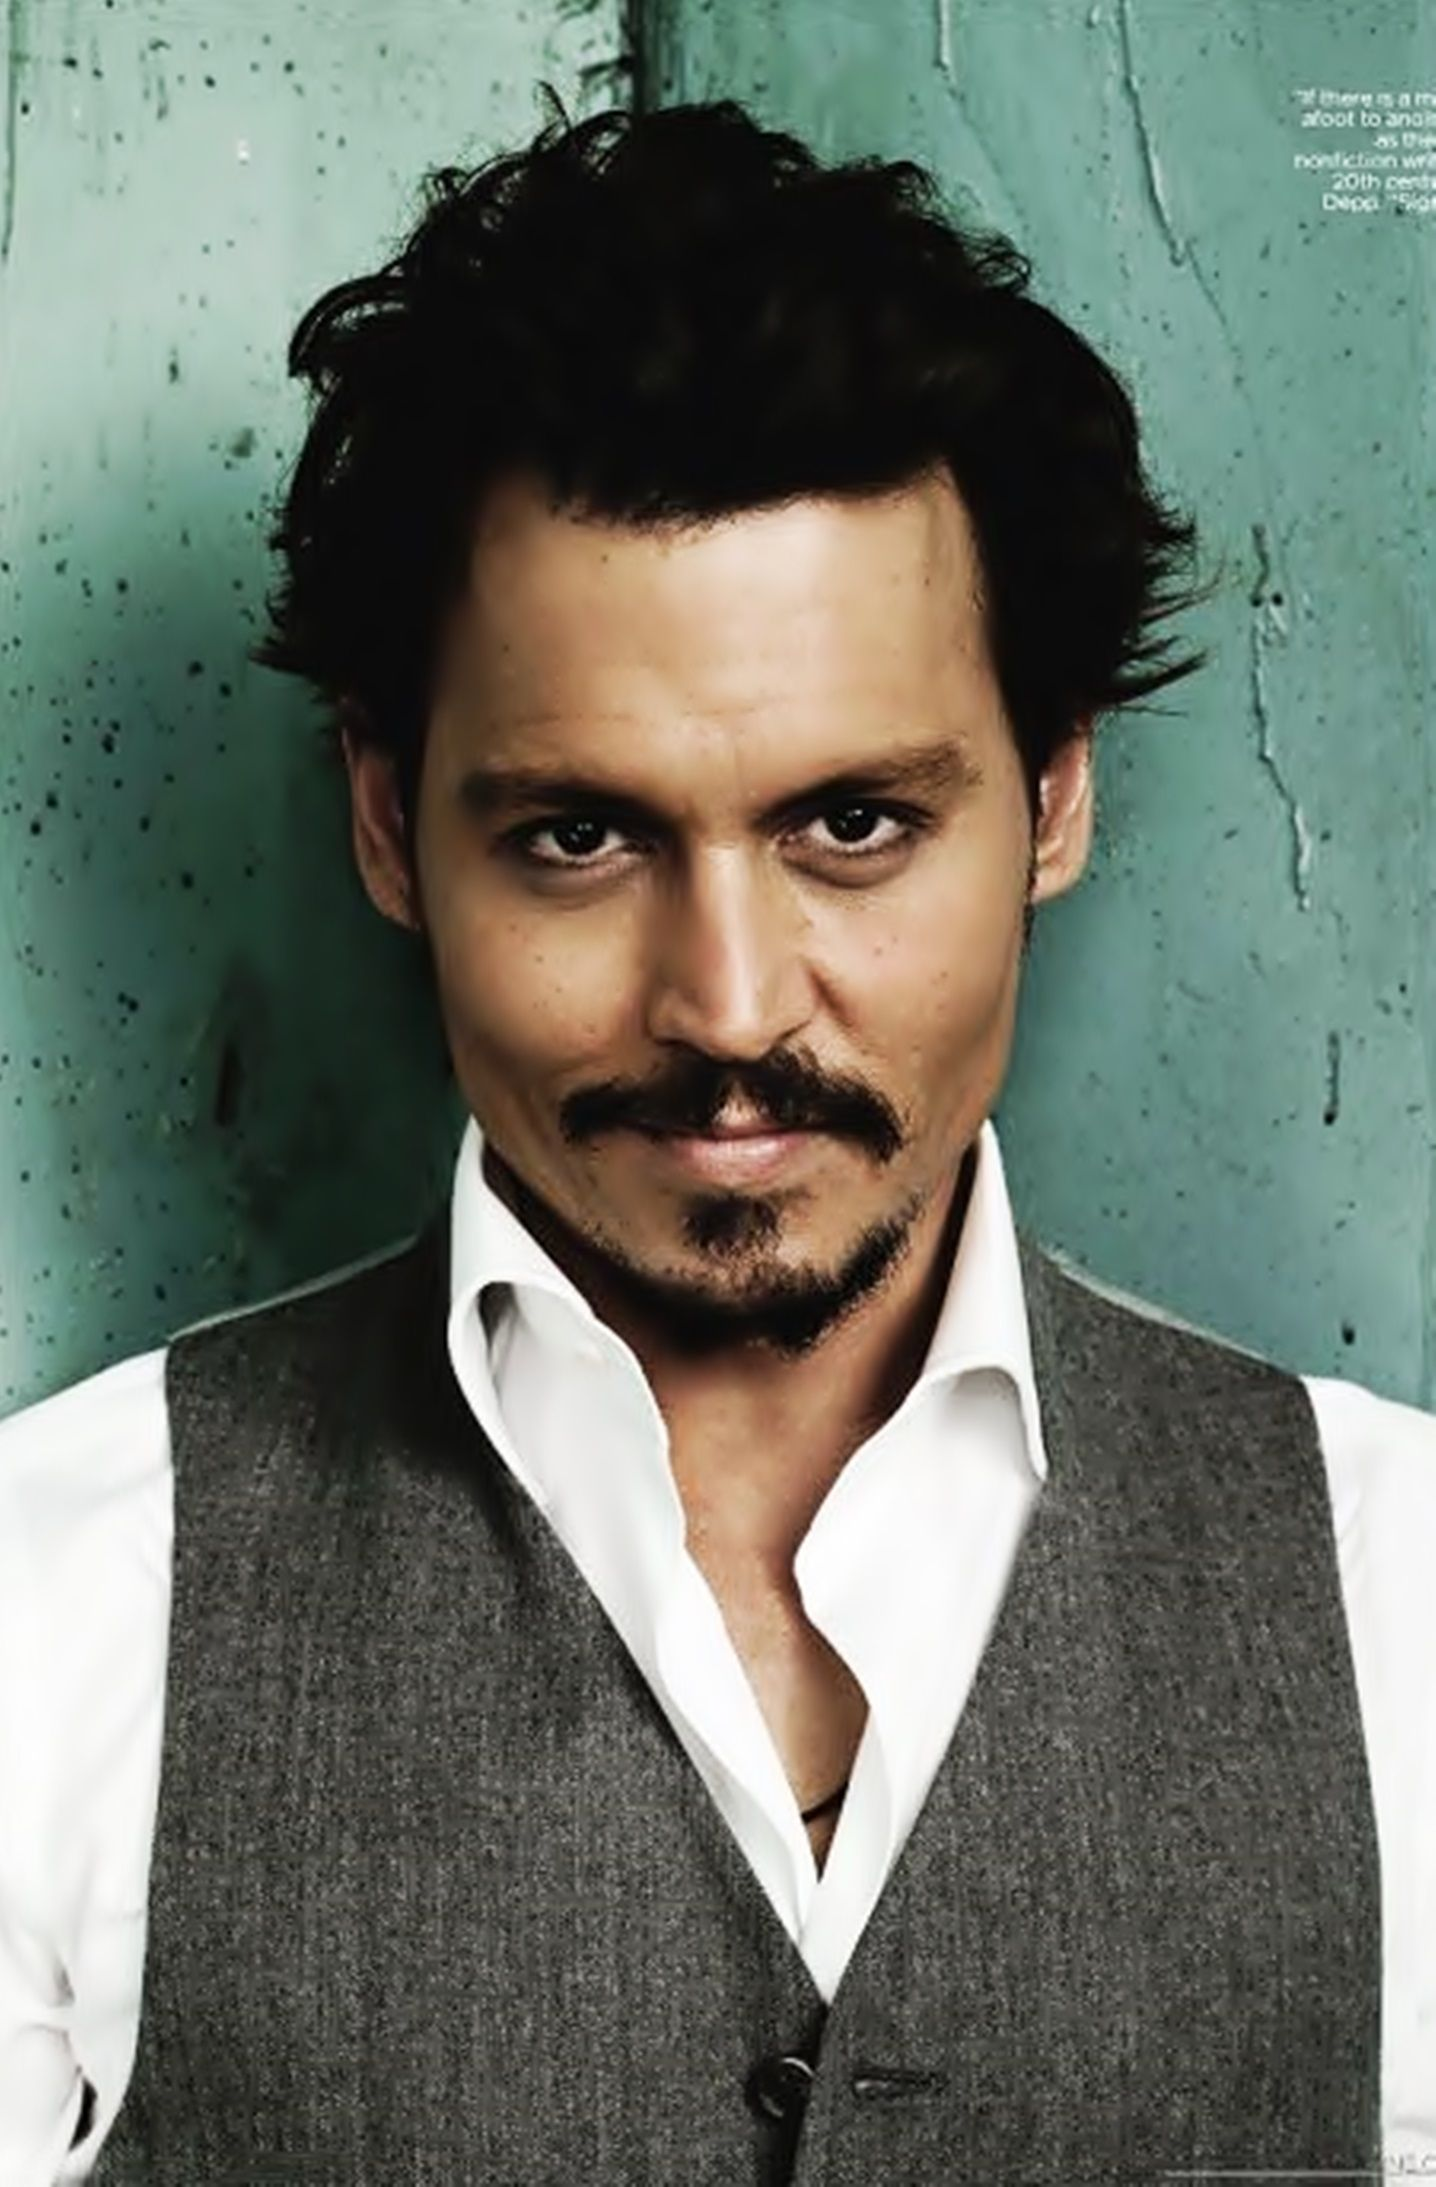 80a99ed7a11 Johnny Depp